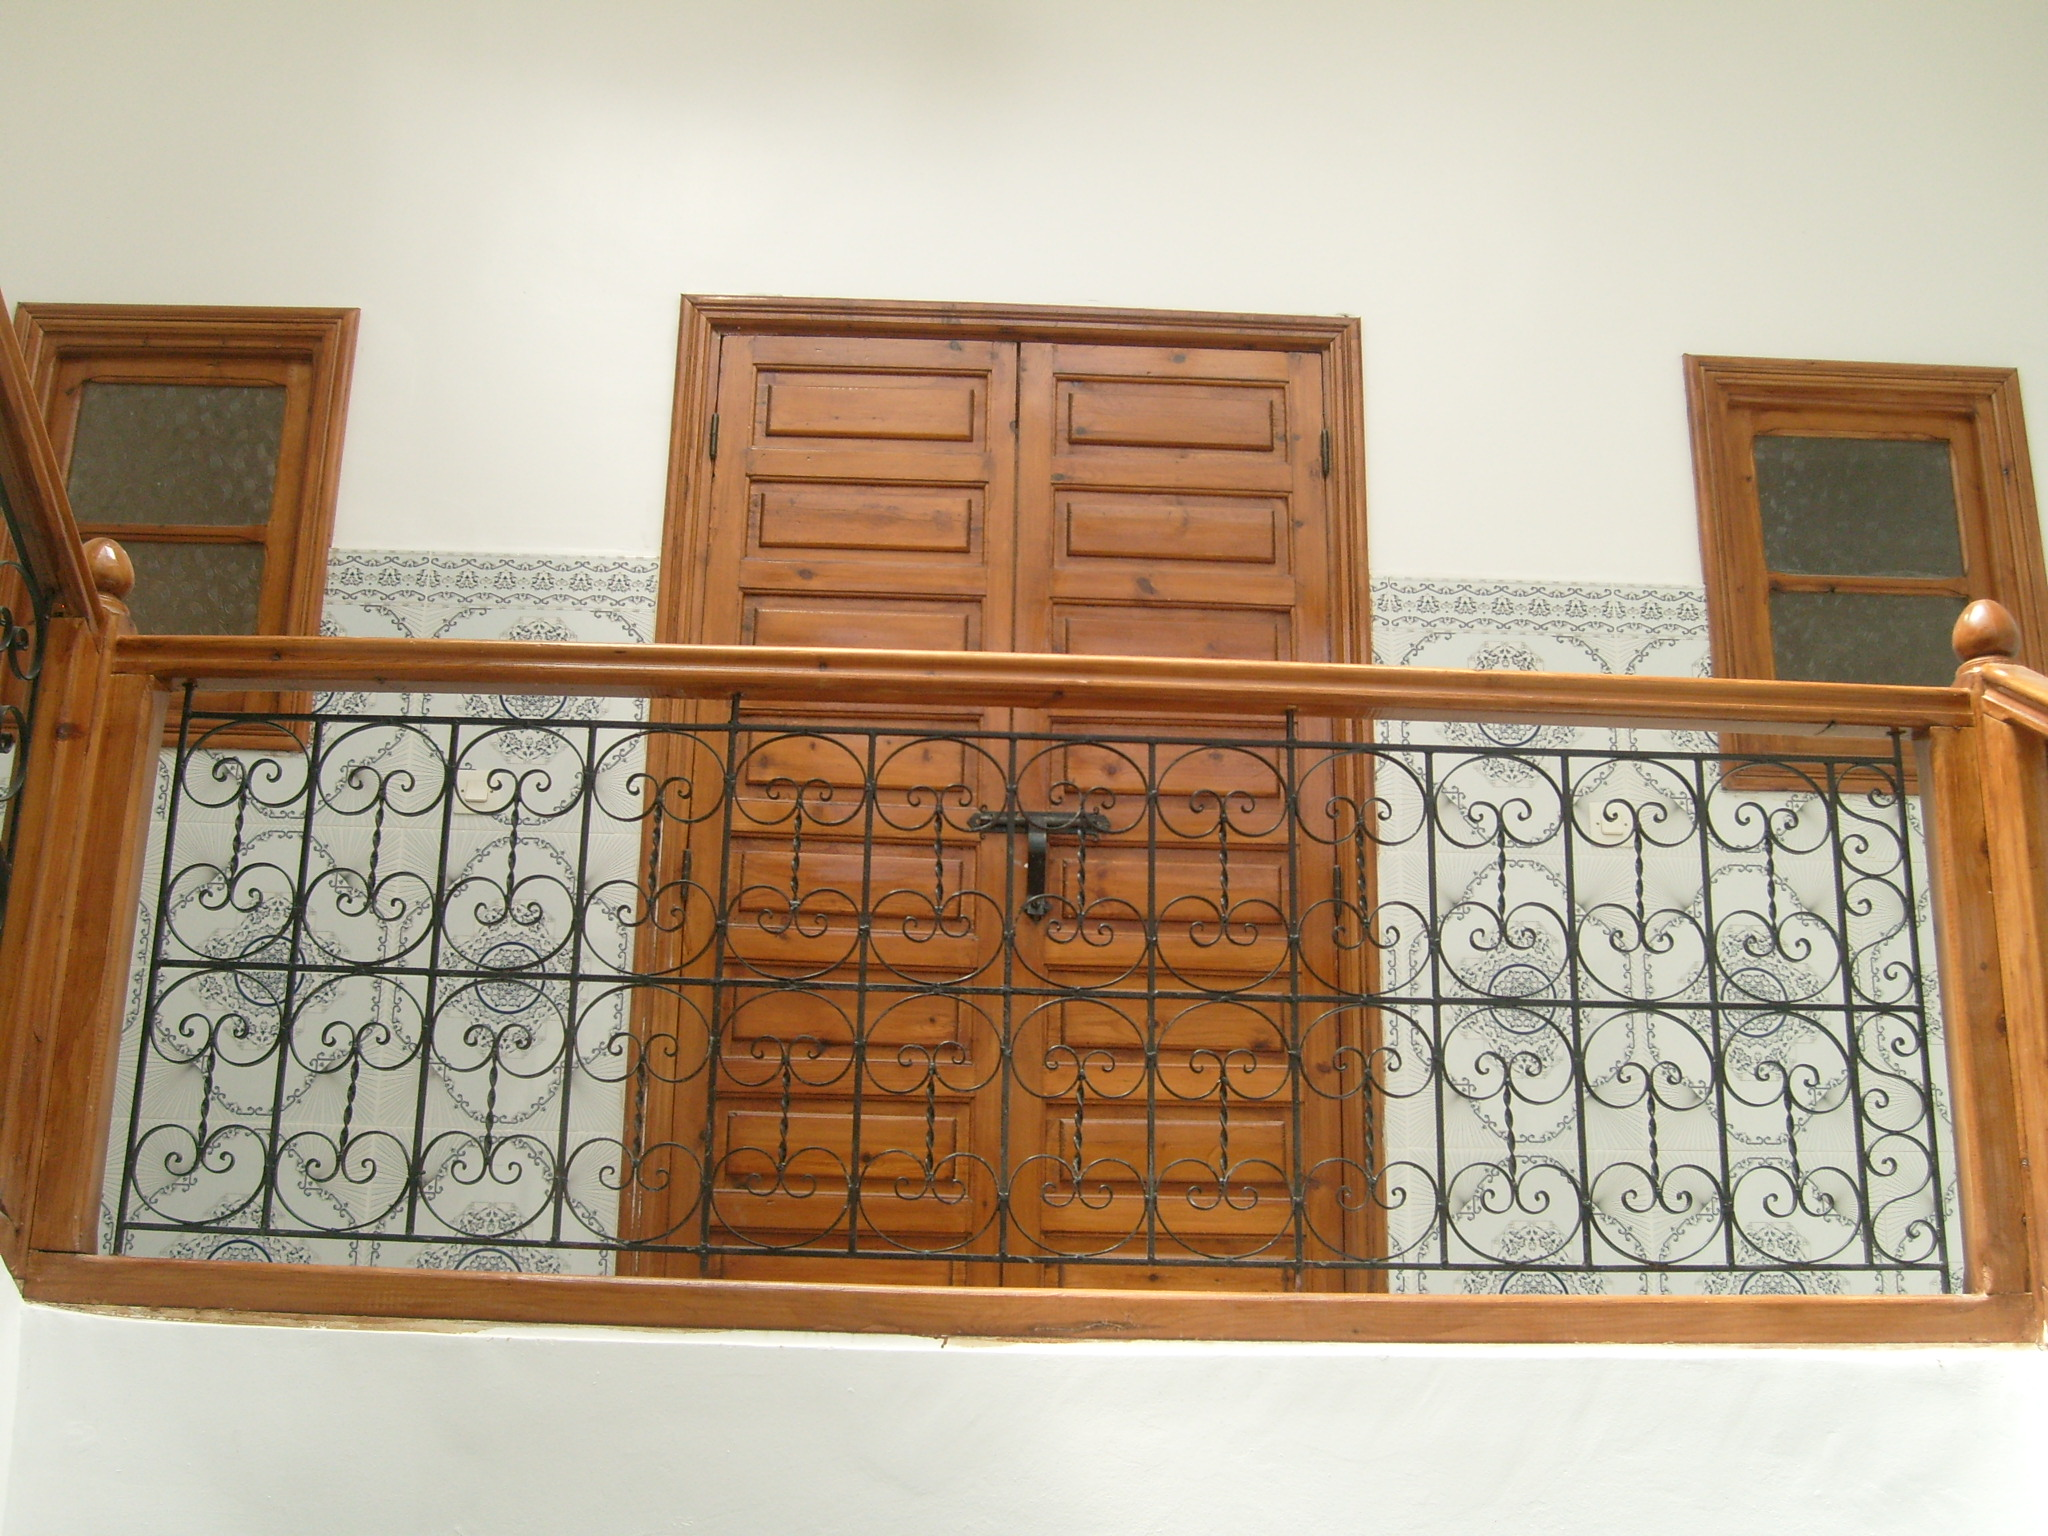 riad marrakech dar said photos puit de lumi re. Black Bedroom Furniture Sets. Home Design Ideas